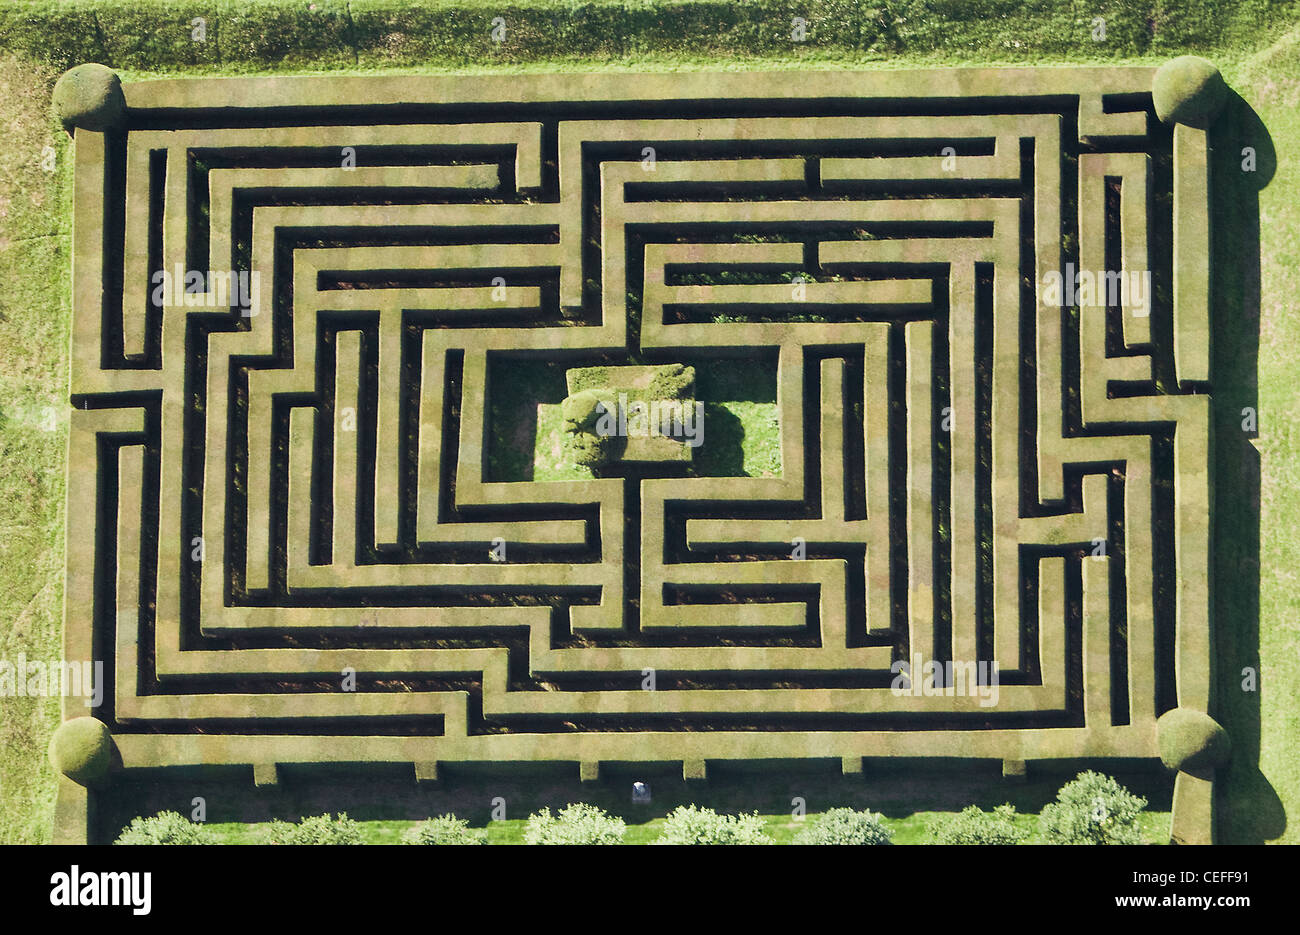 Vista aérea del laberinto de coberturas Imagen De Stock